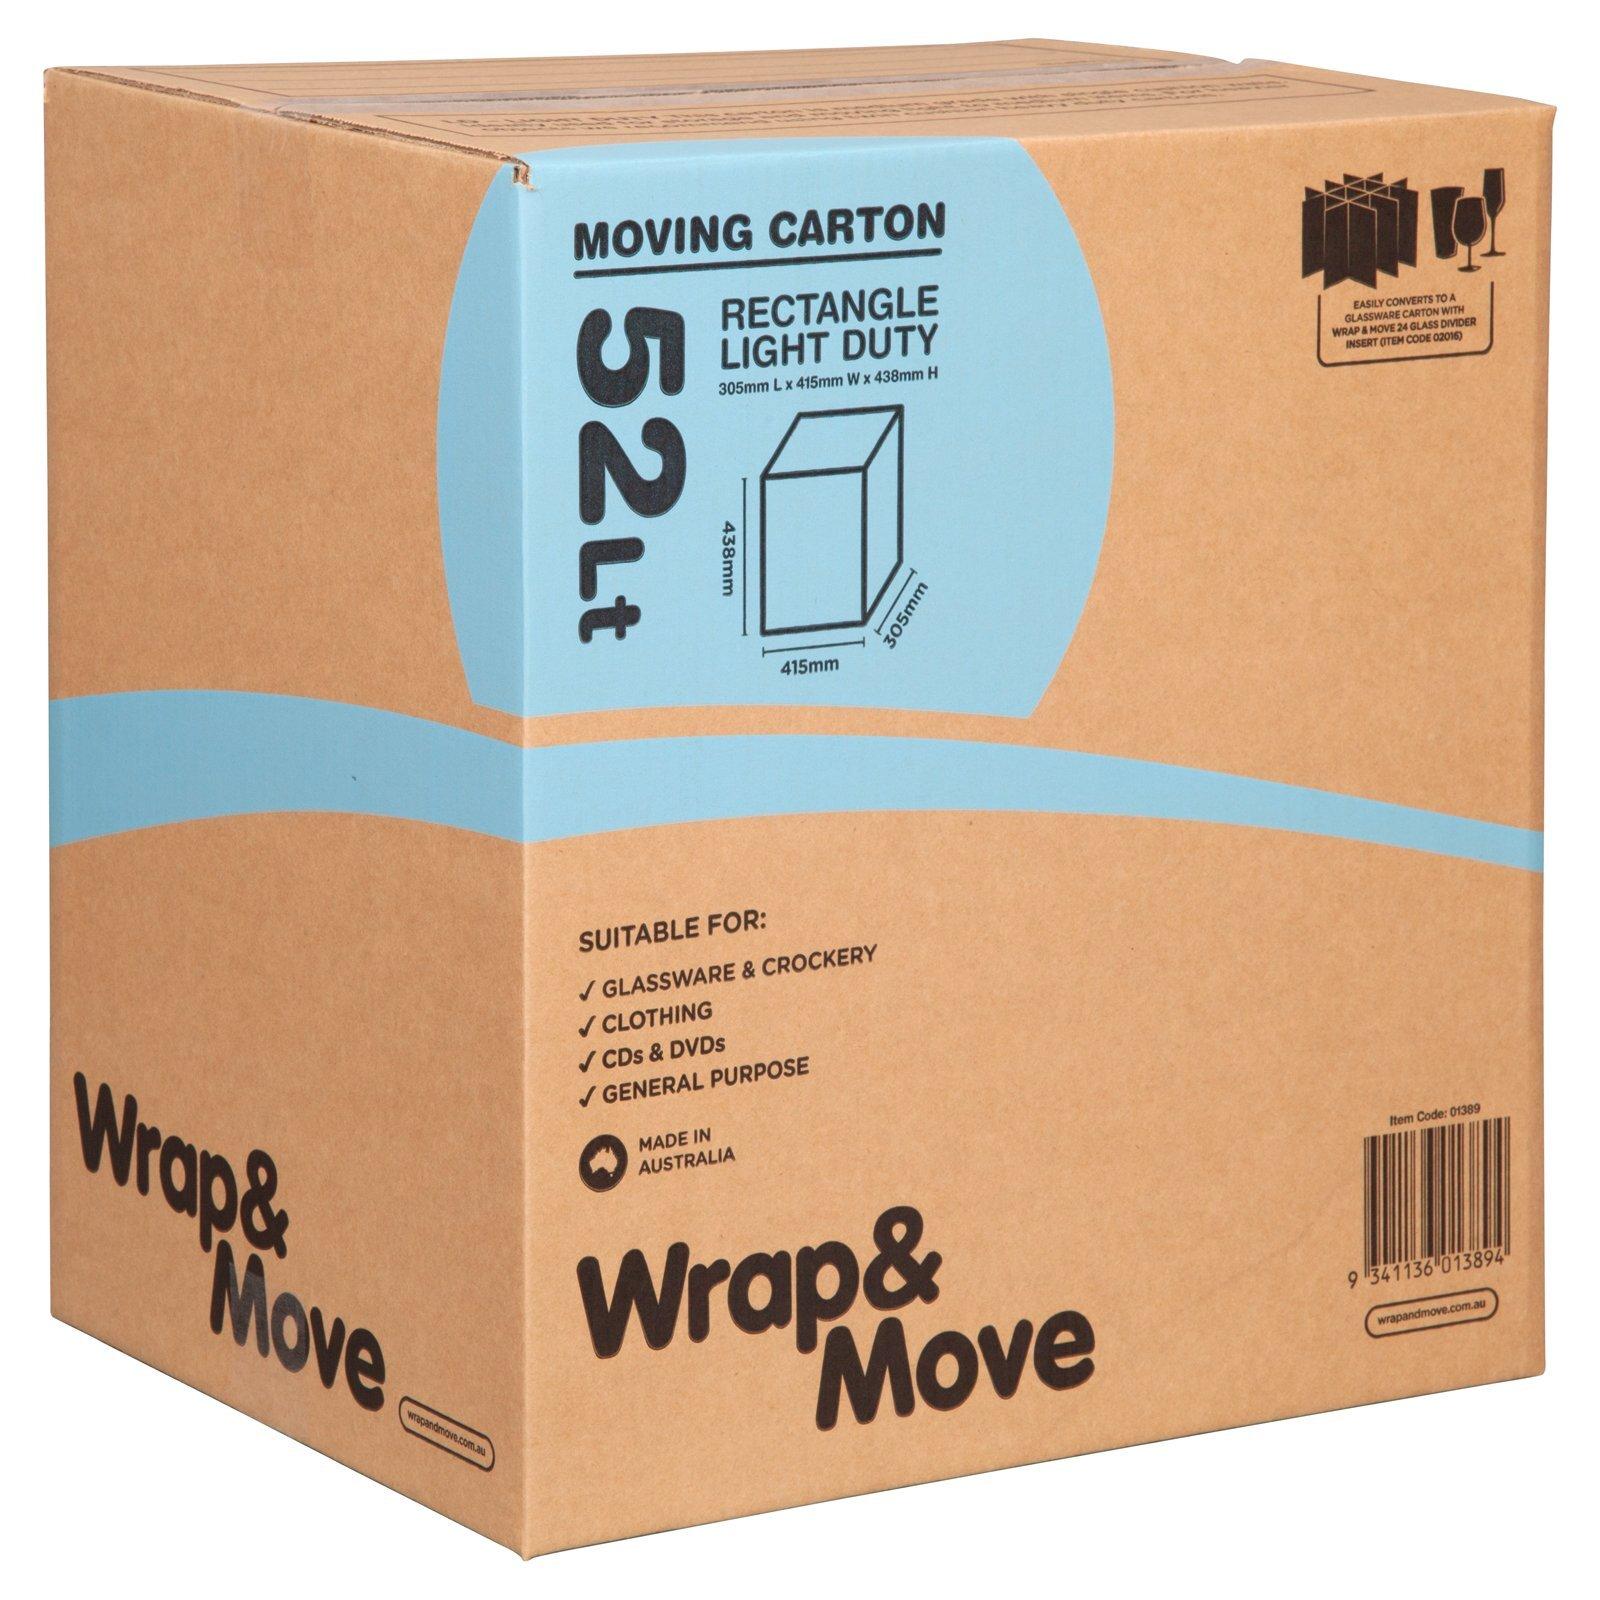 Wrap & Move 52Lt Light Duty Rectangle Moving Carton